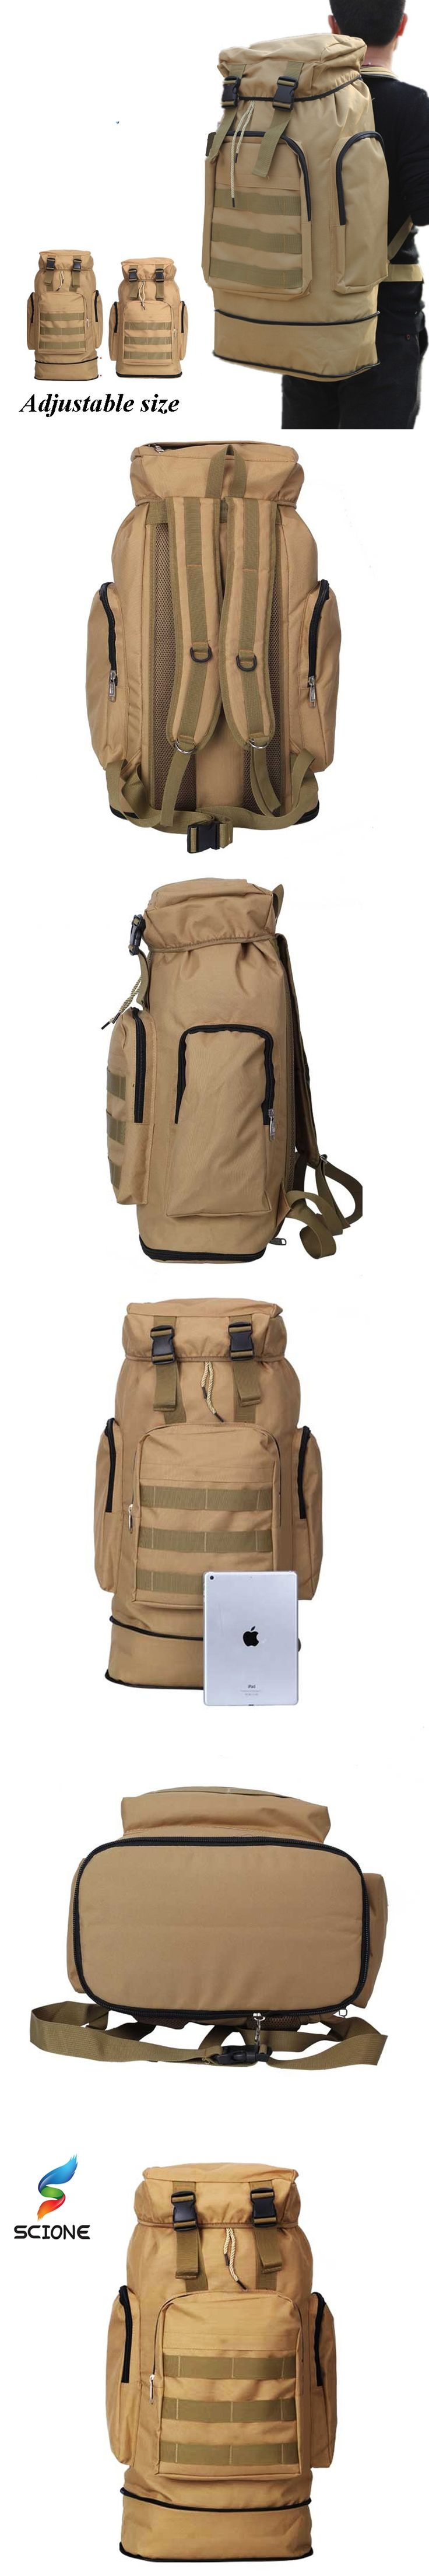 2017 Hot Army Men Women Outdoor Military Tactical Backpack Camping Hiking Rifle Bag Trekking Sport Travel Rucksacks Climbing Bag